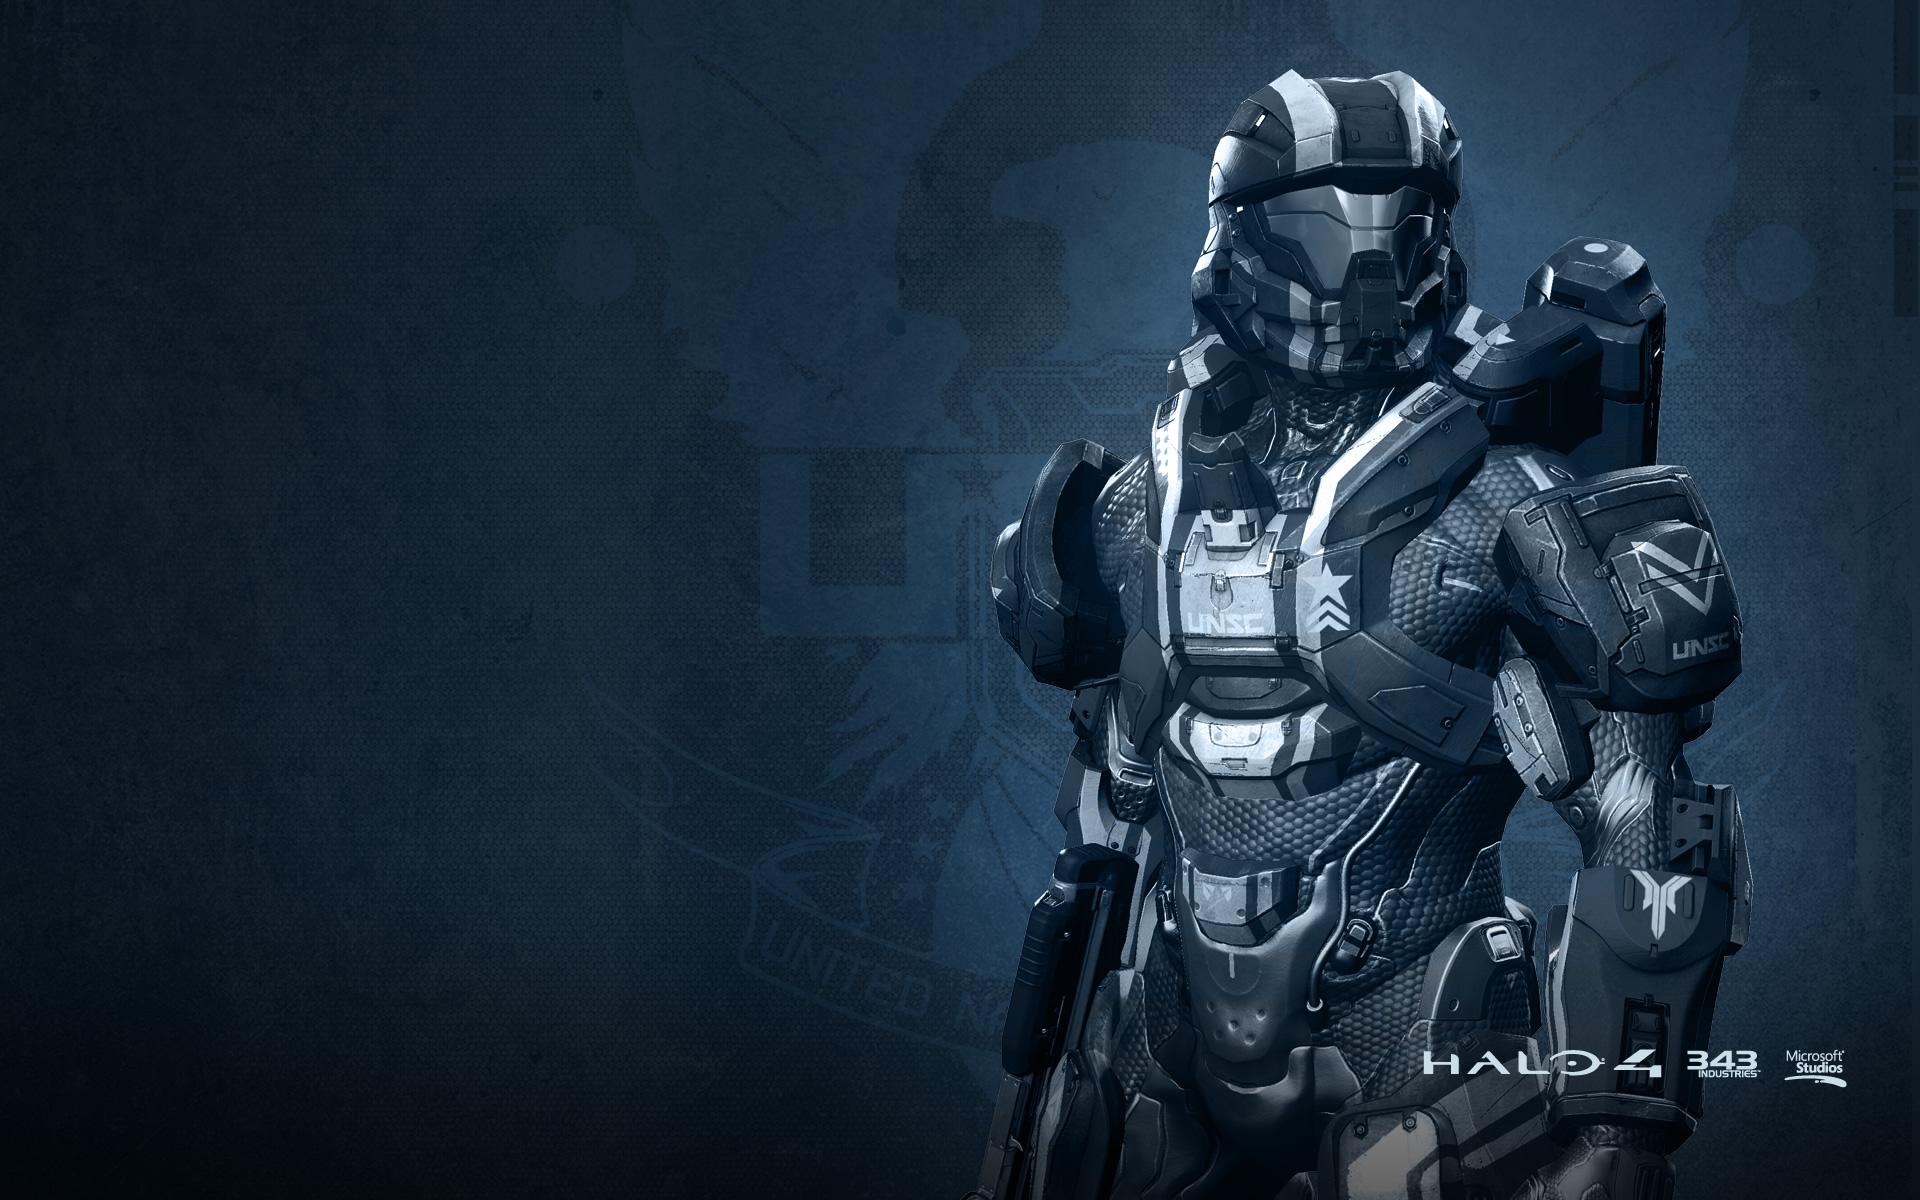 Halo 4 Spartan Ops Wallpaper2 1920x1200